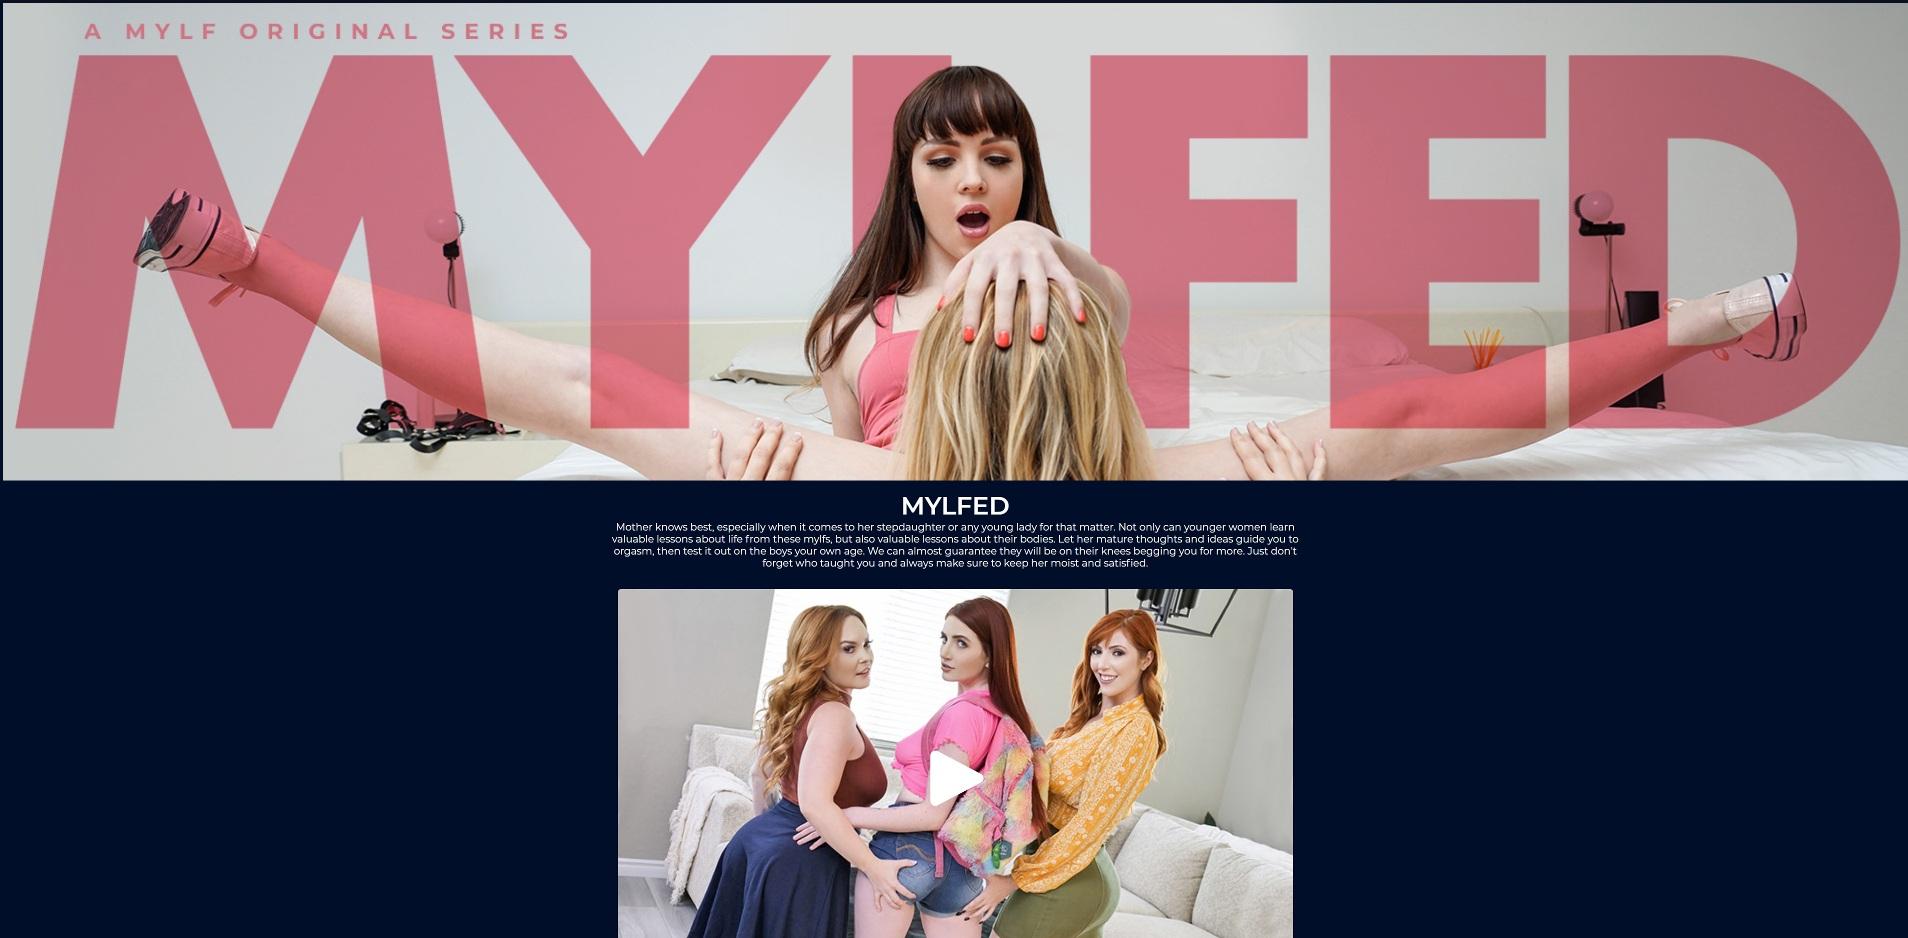 110 Mylfed M - Mylfed.com - Full SiteRip!